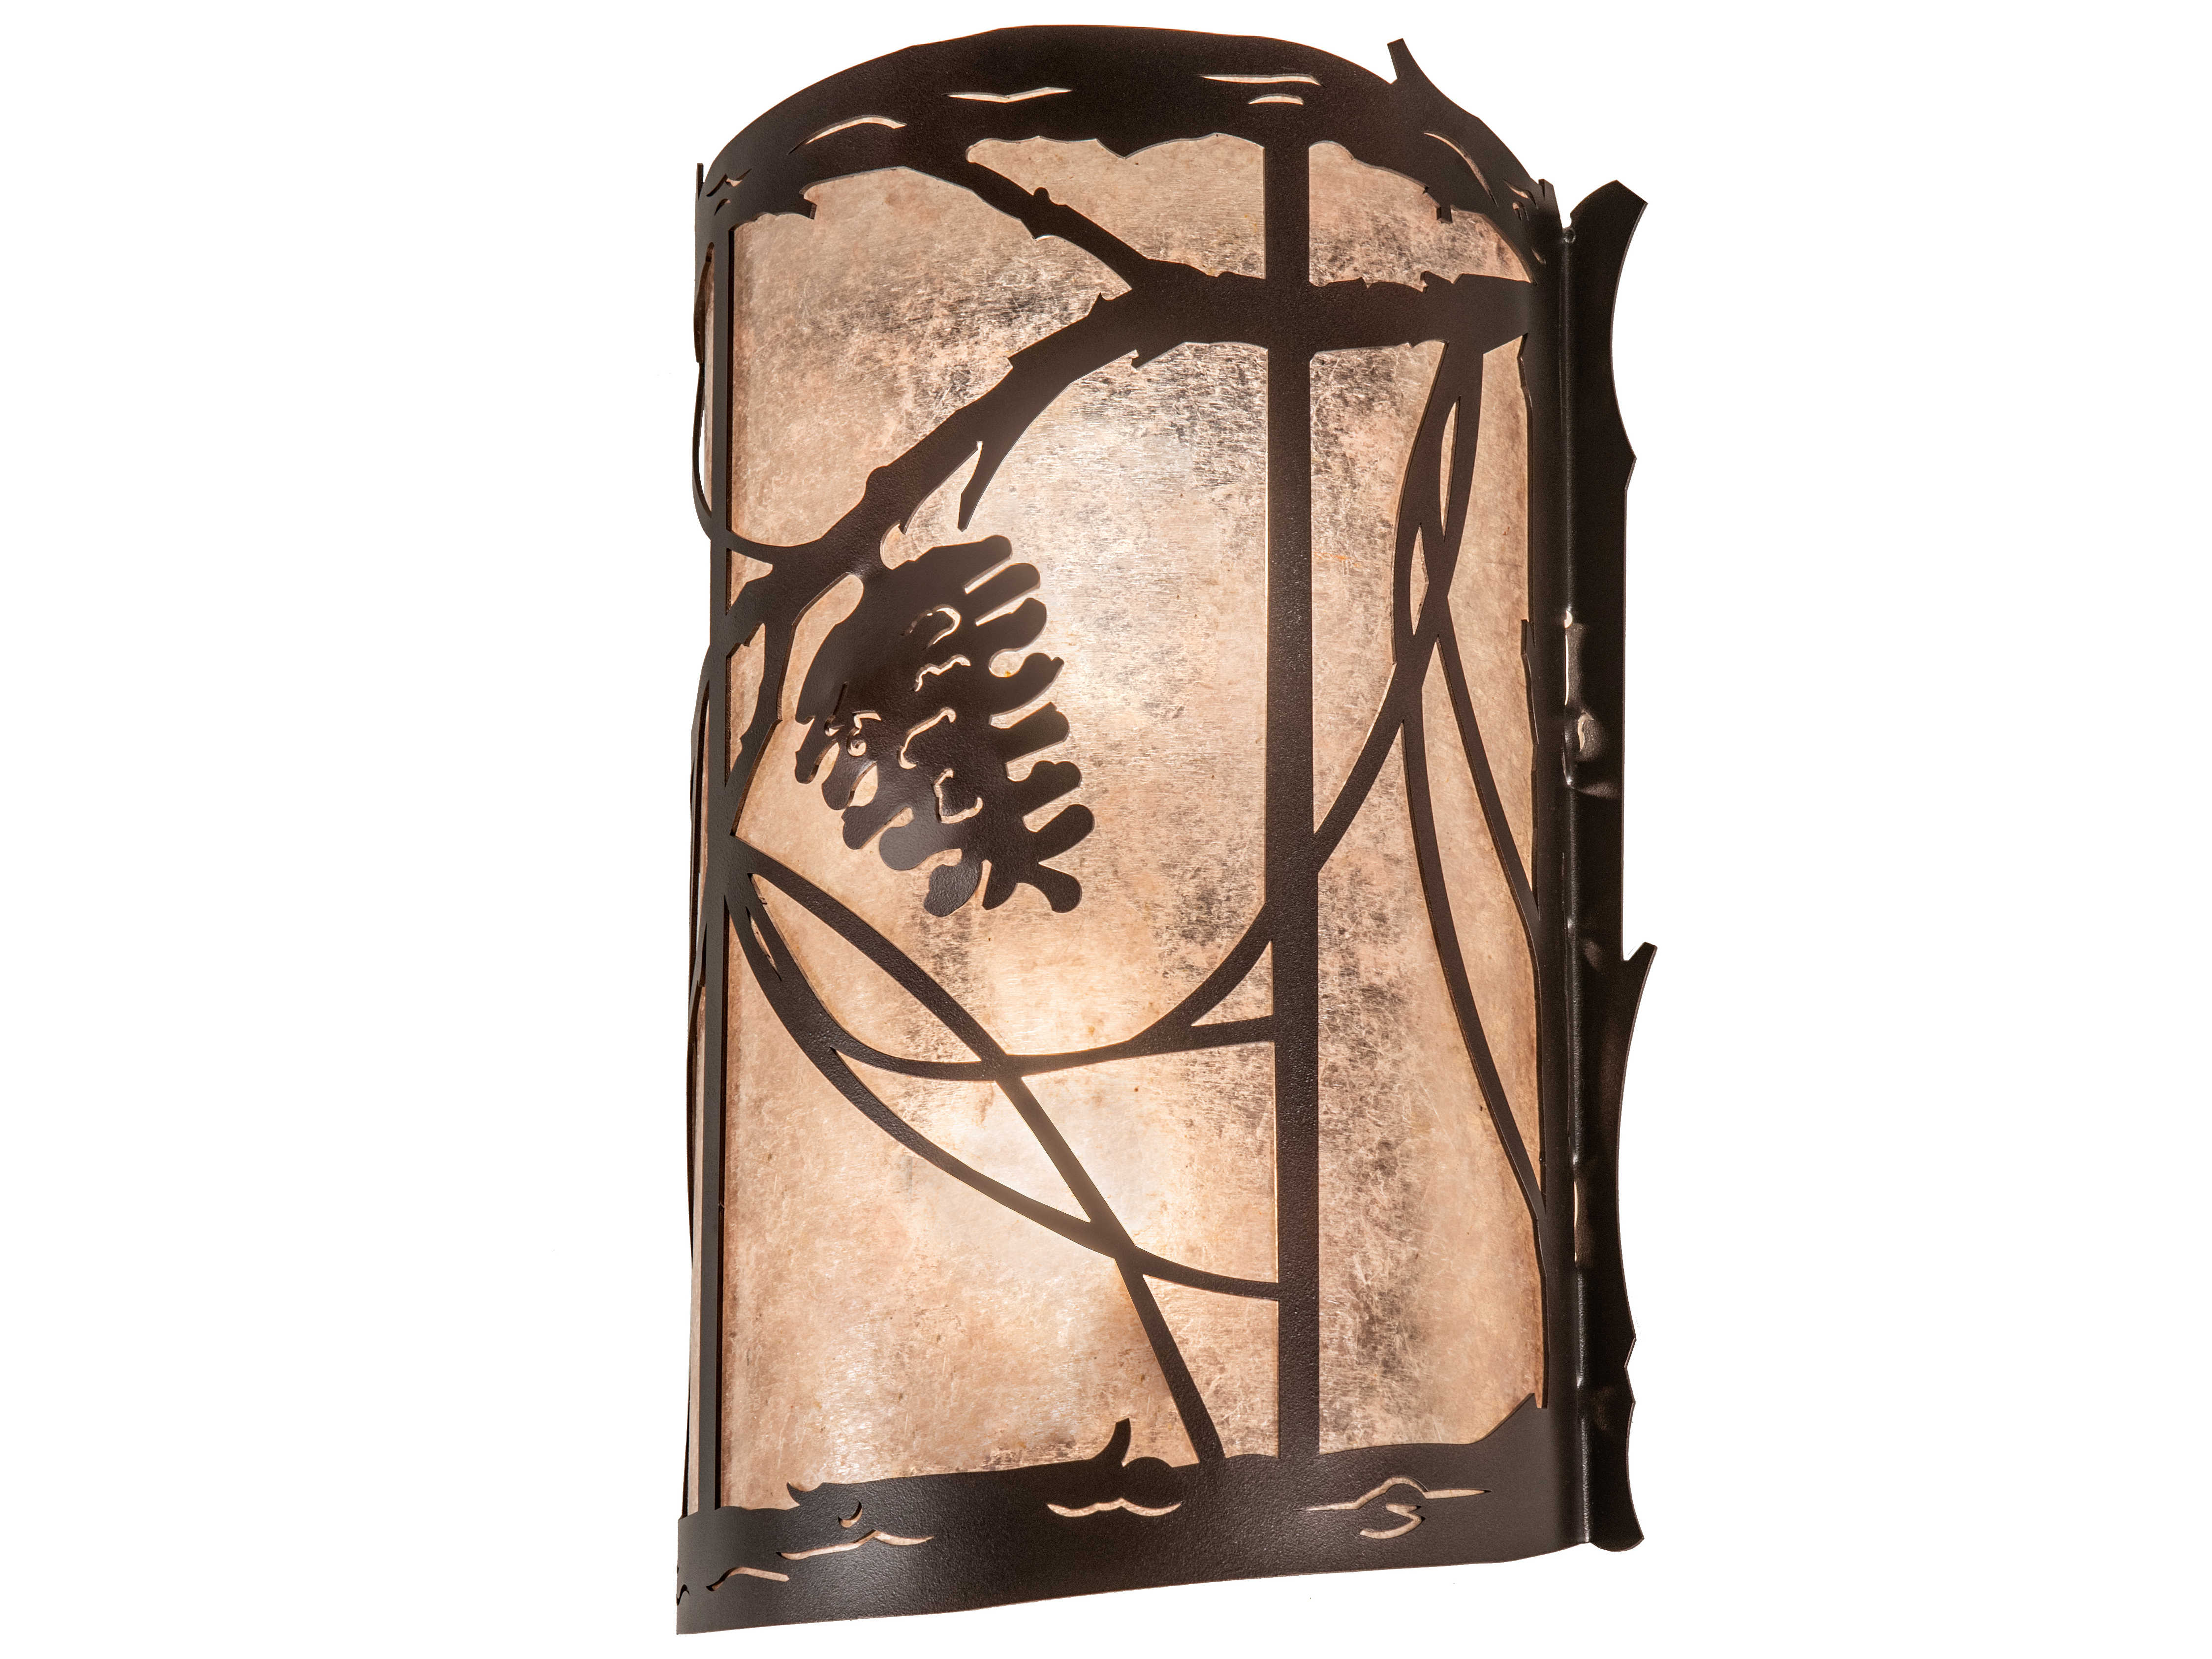 Meyda Whispering Pines Mahogany Bronze 2 Light Rustic Lodge Vanity Light My231469